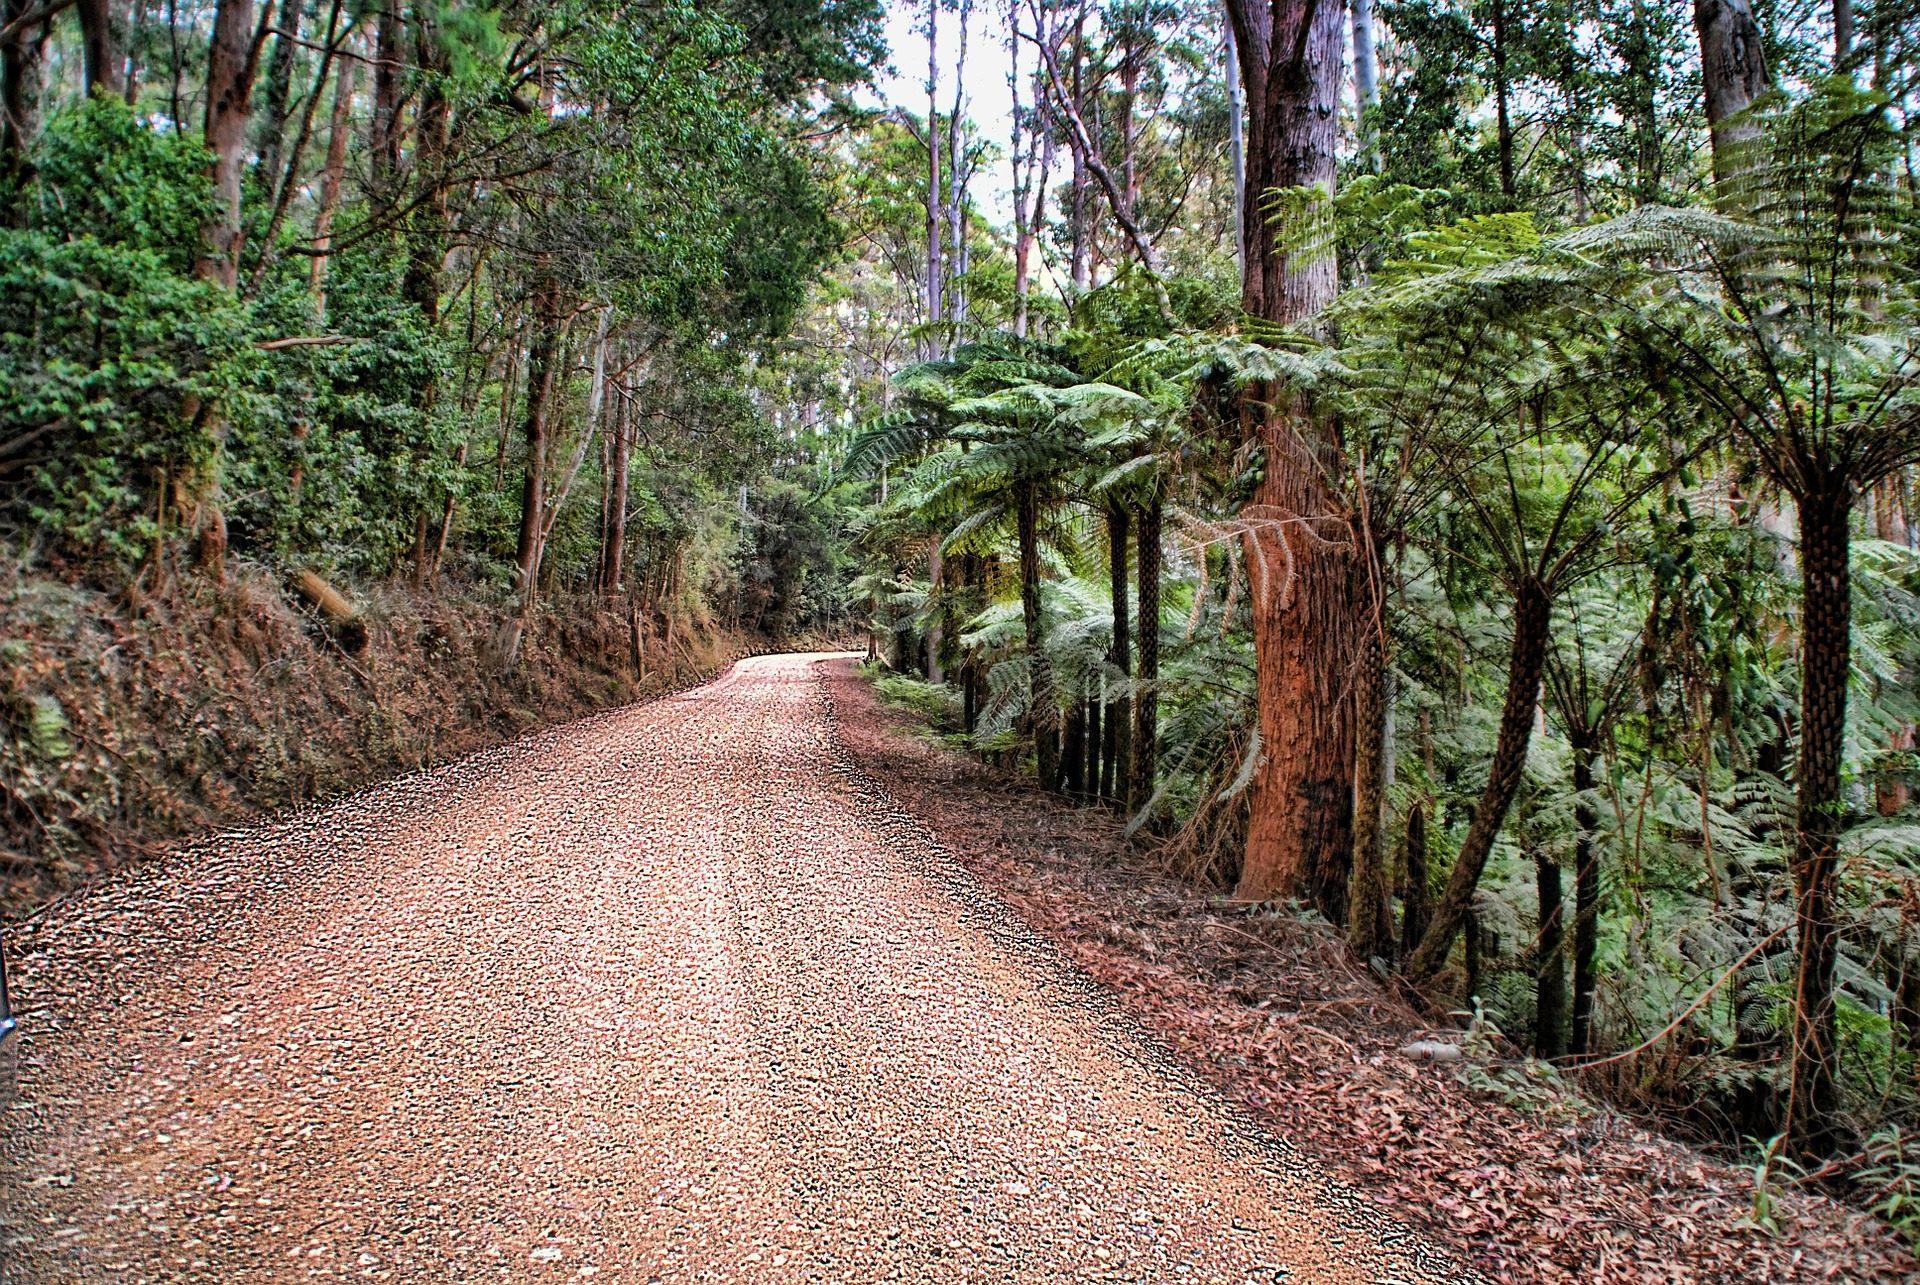 camino, सड़क, जंगल, पेड़, खरपतवार, वनस्पति - HD वॉलपेपर - प्रोफेसर-falken.com